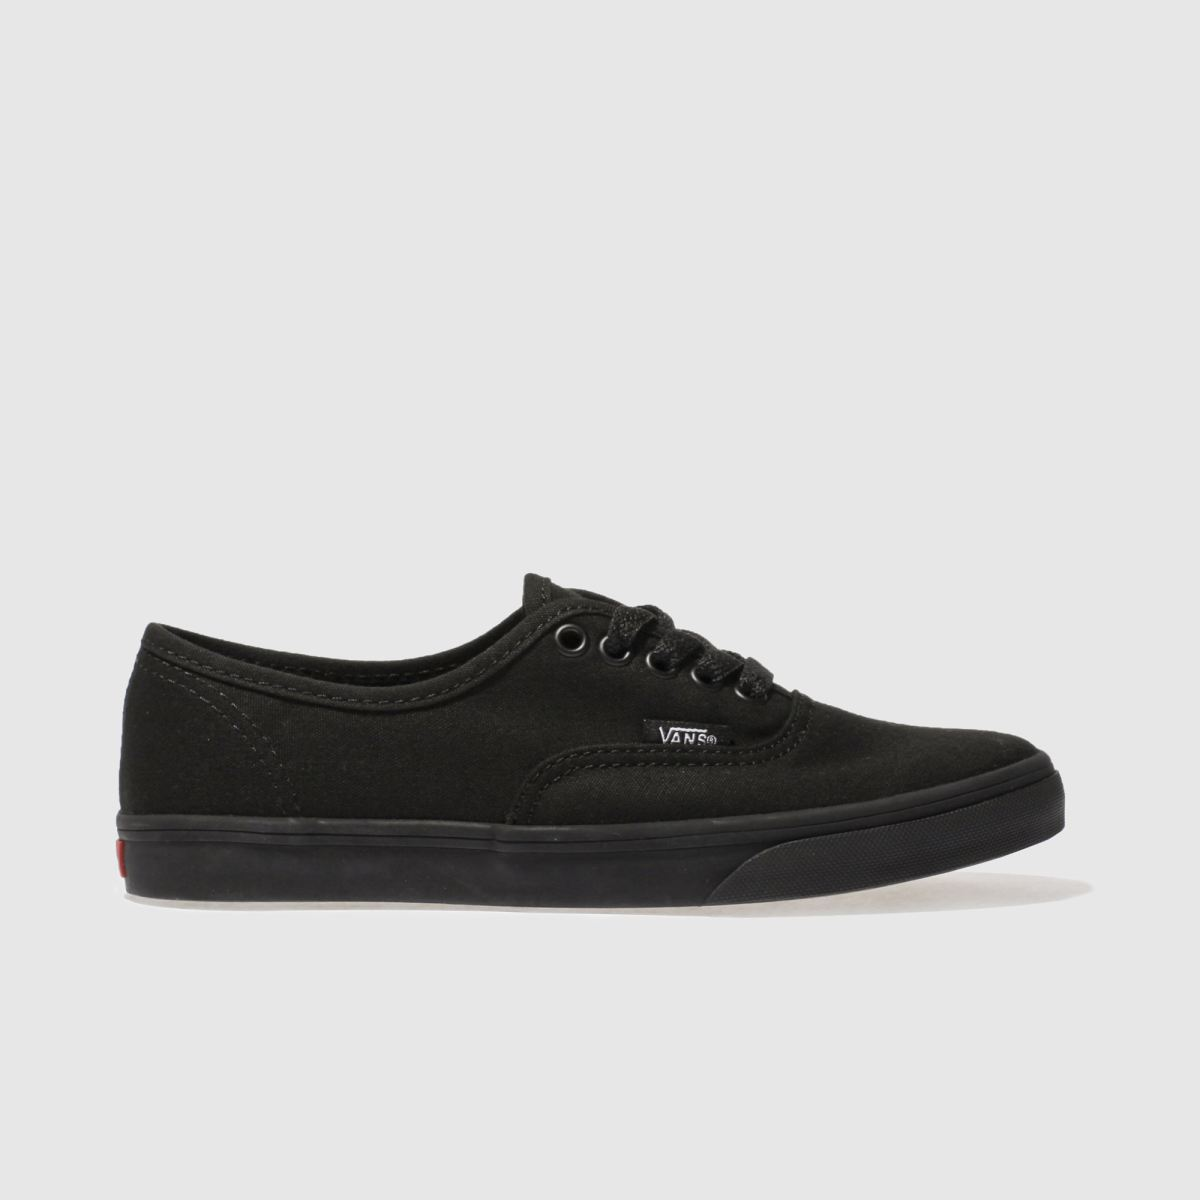 Vans Shoes For Girls oxforddynamics.co.uk